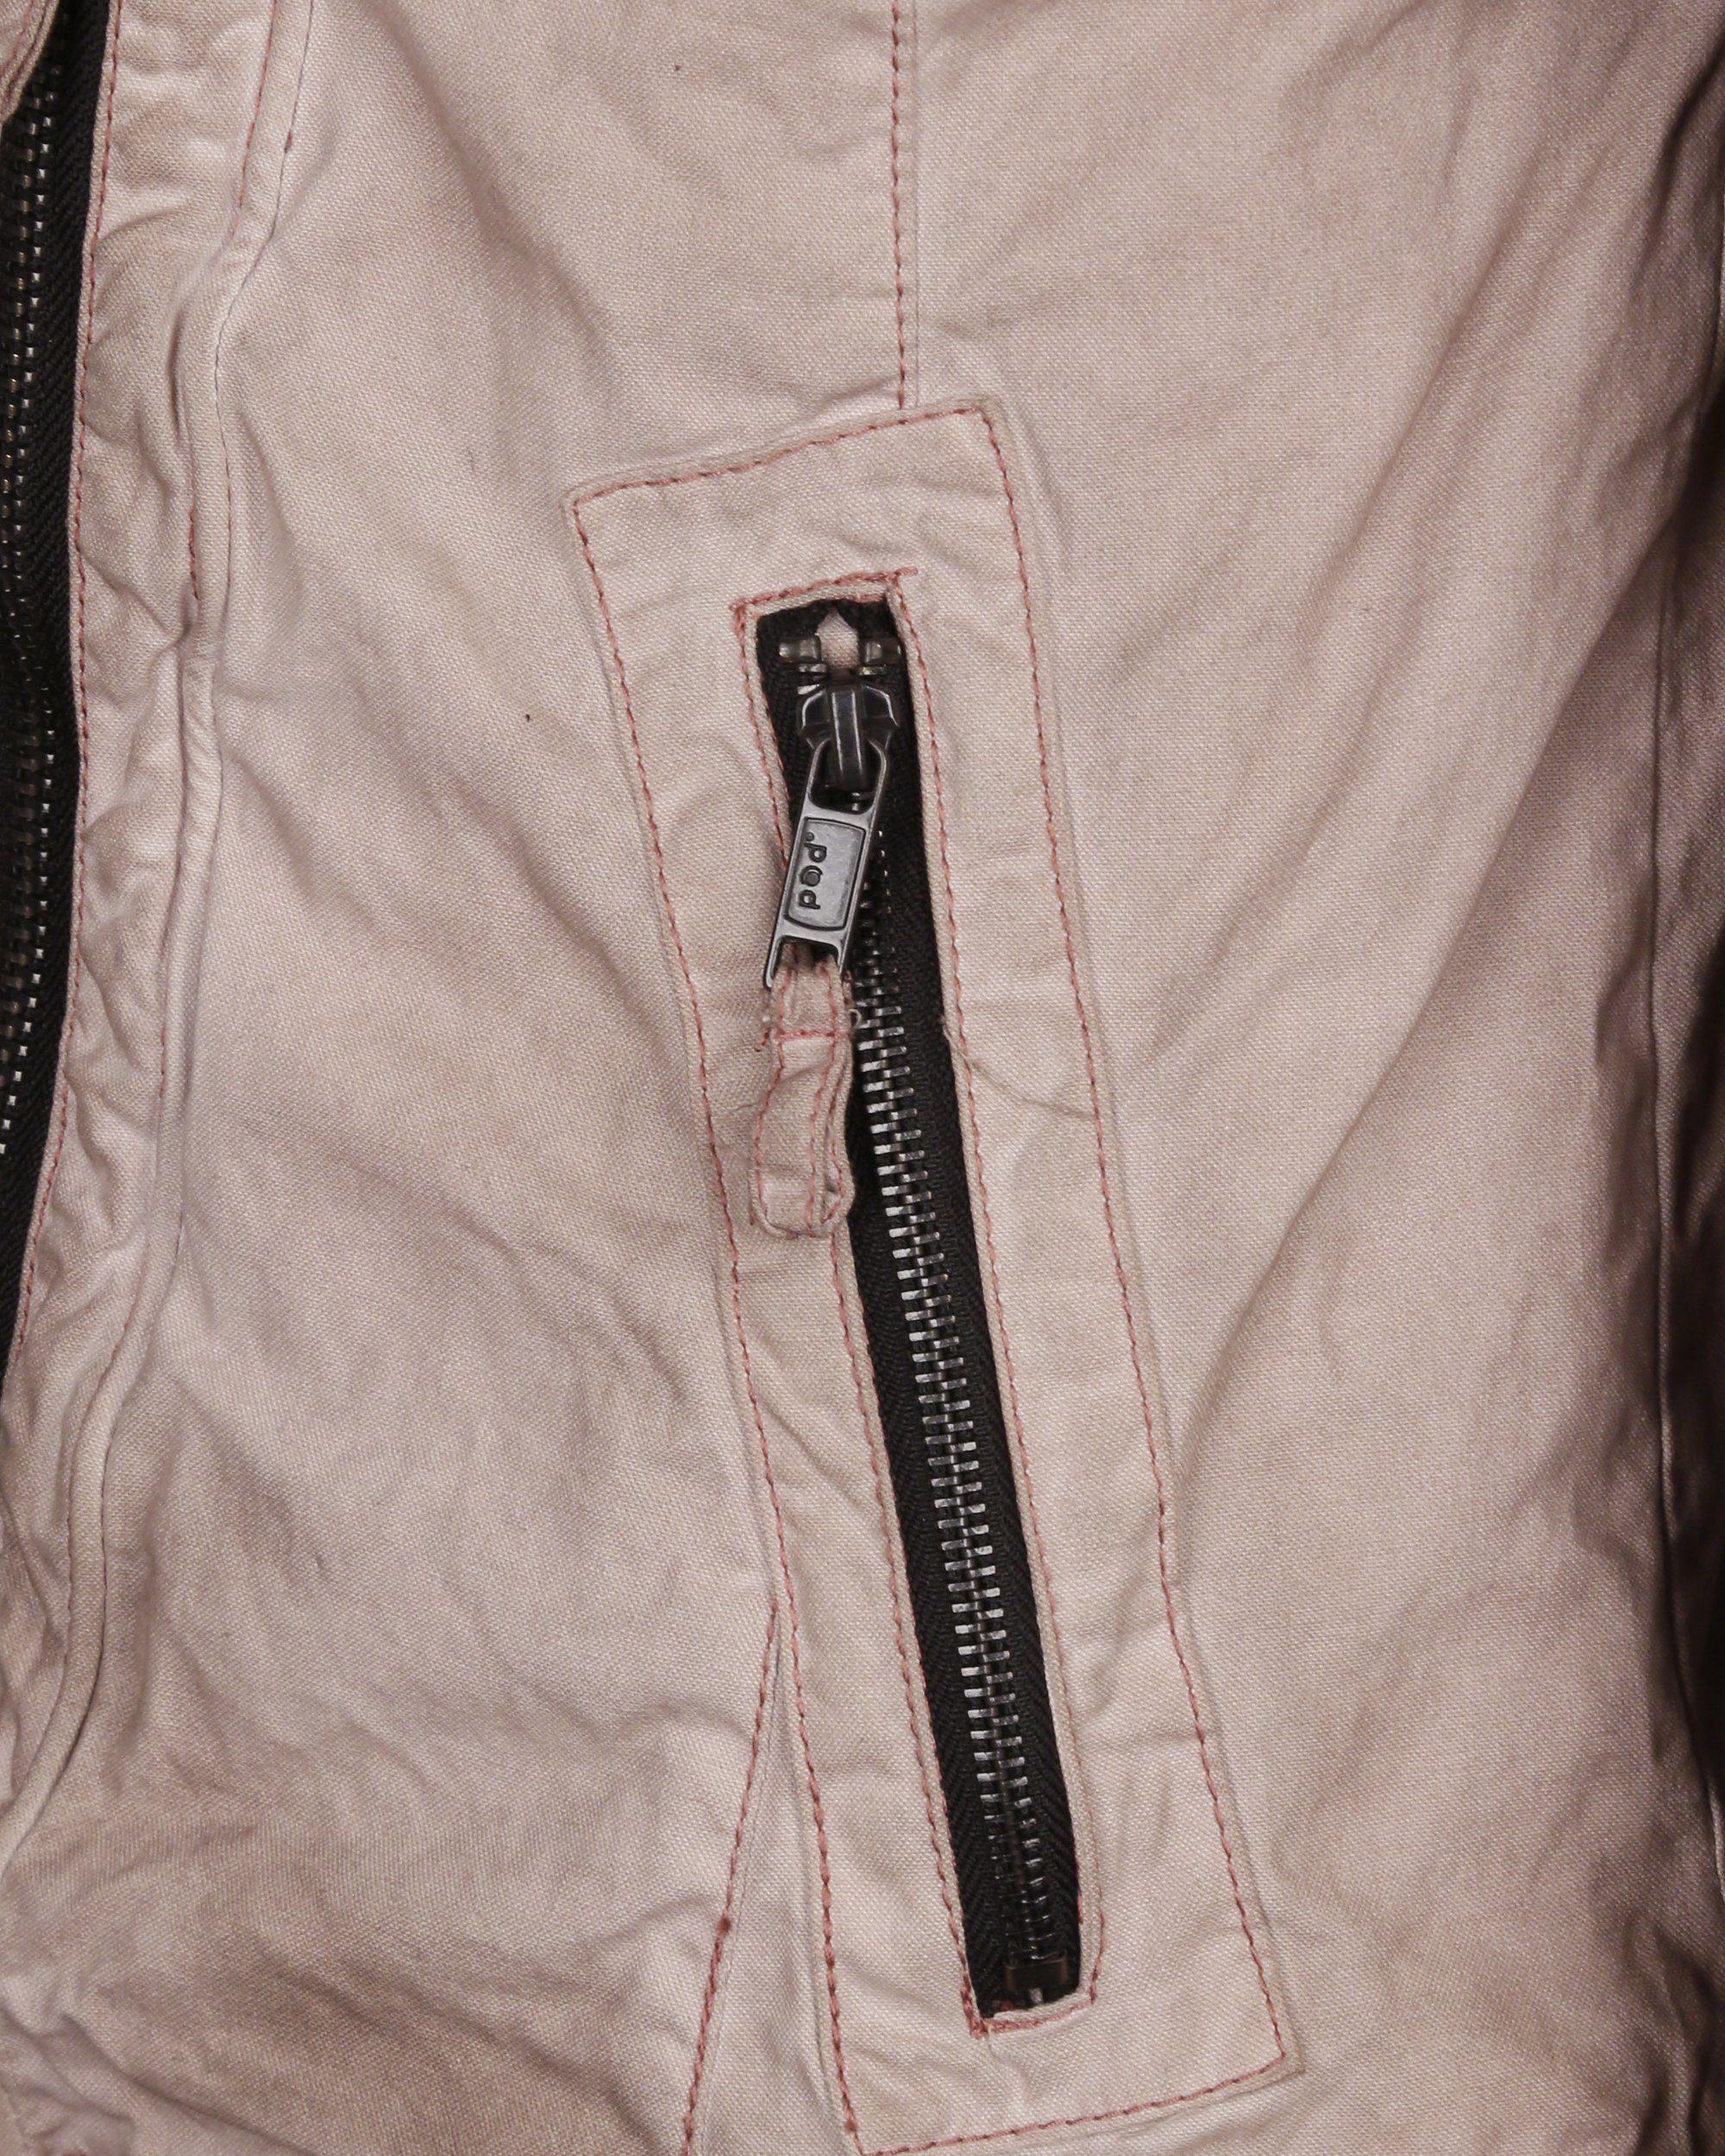 JCC Textiljacke körpernah geschnitten Japura